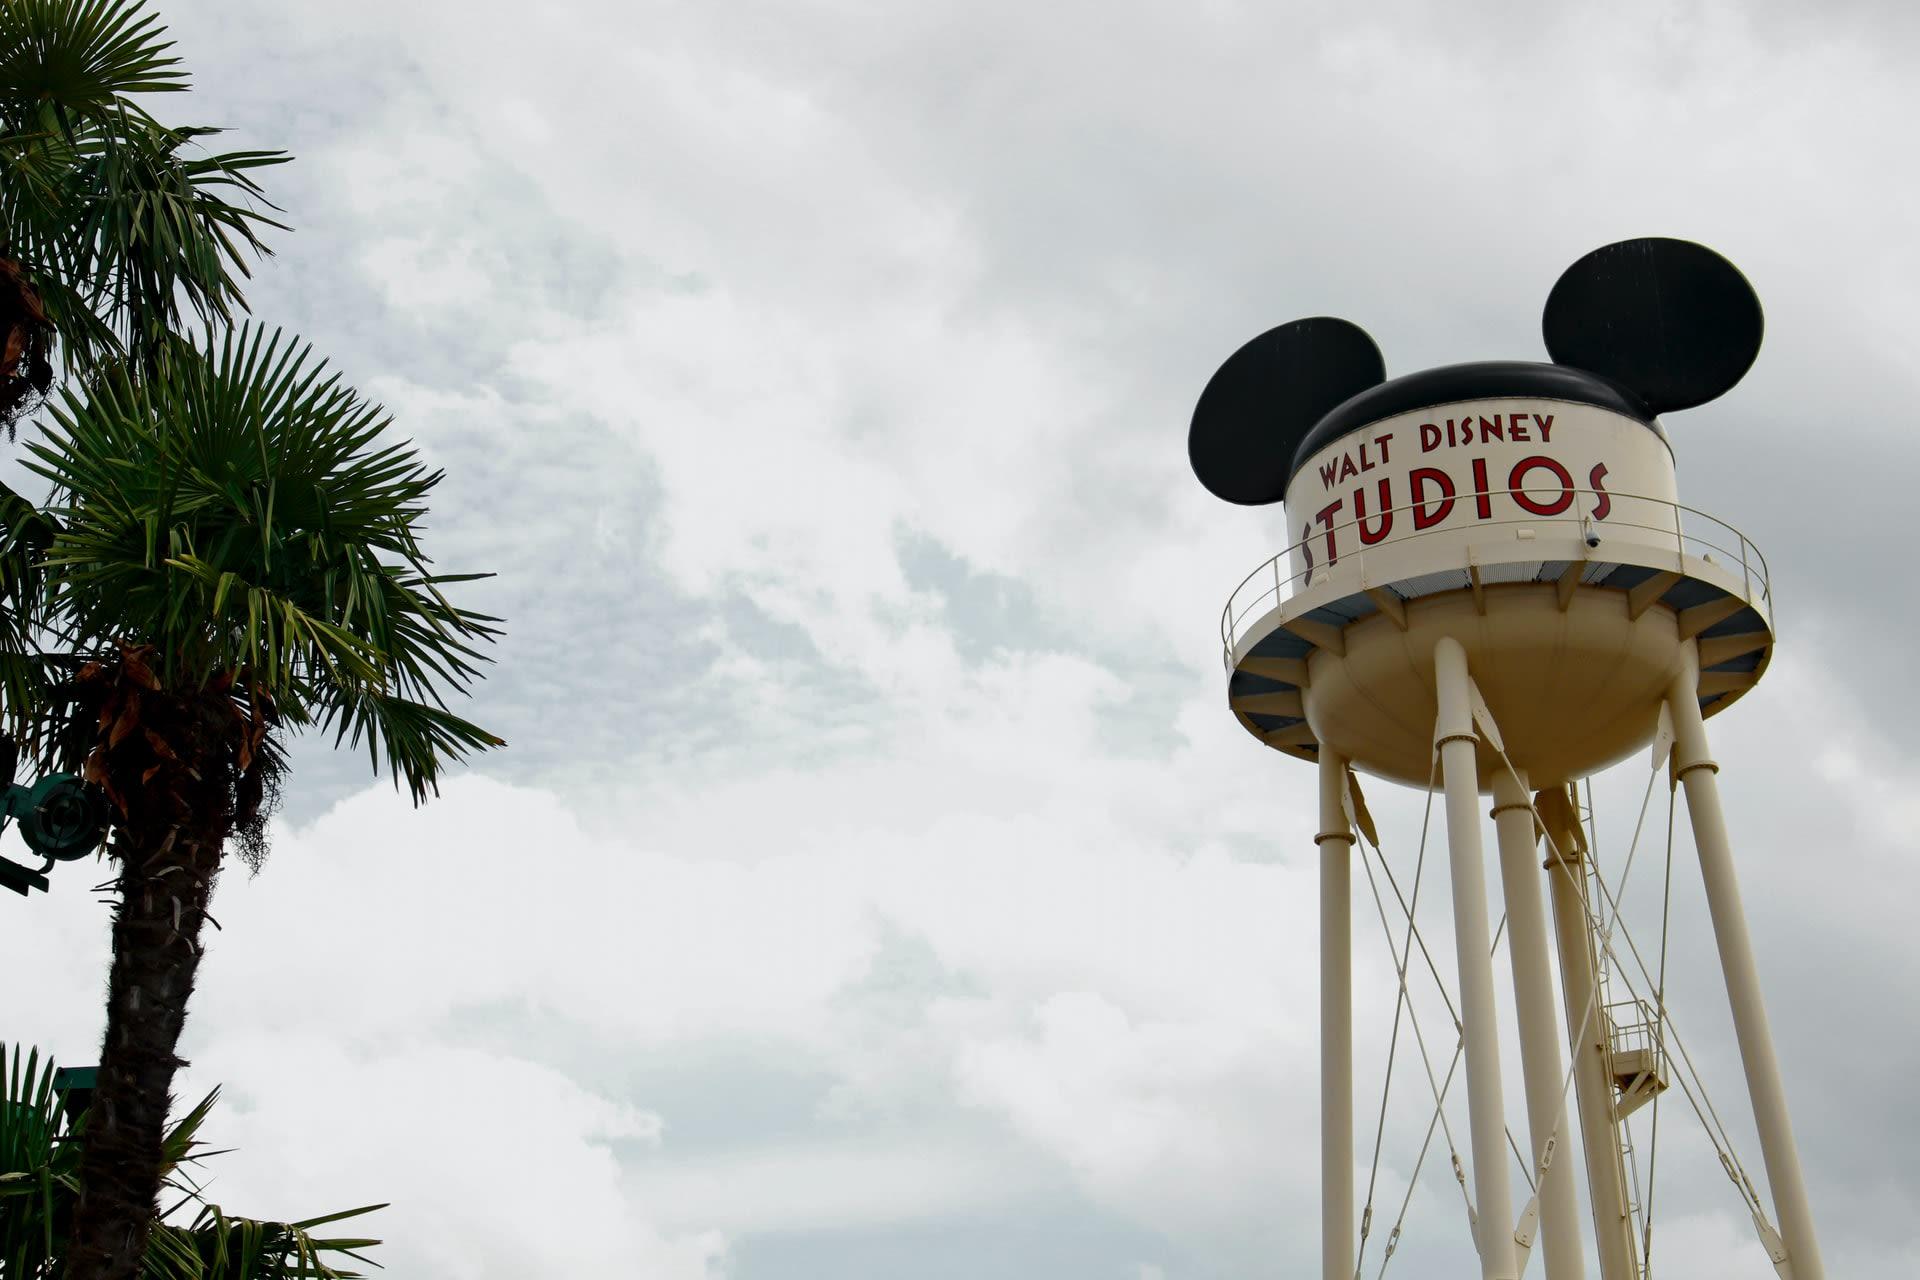 Los Angeles - Studios on Sundays - Walt Disney Studios in Burbank